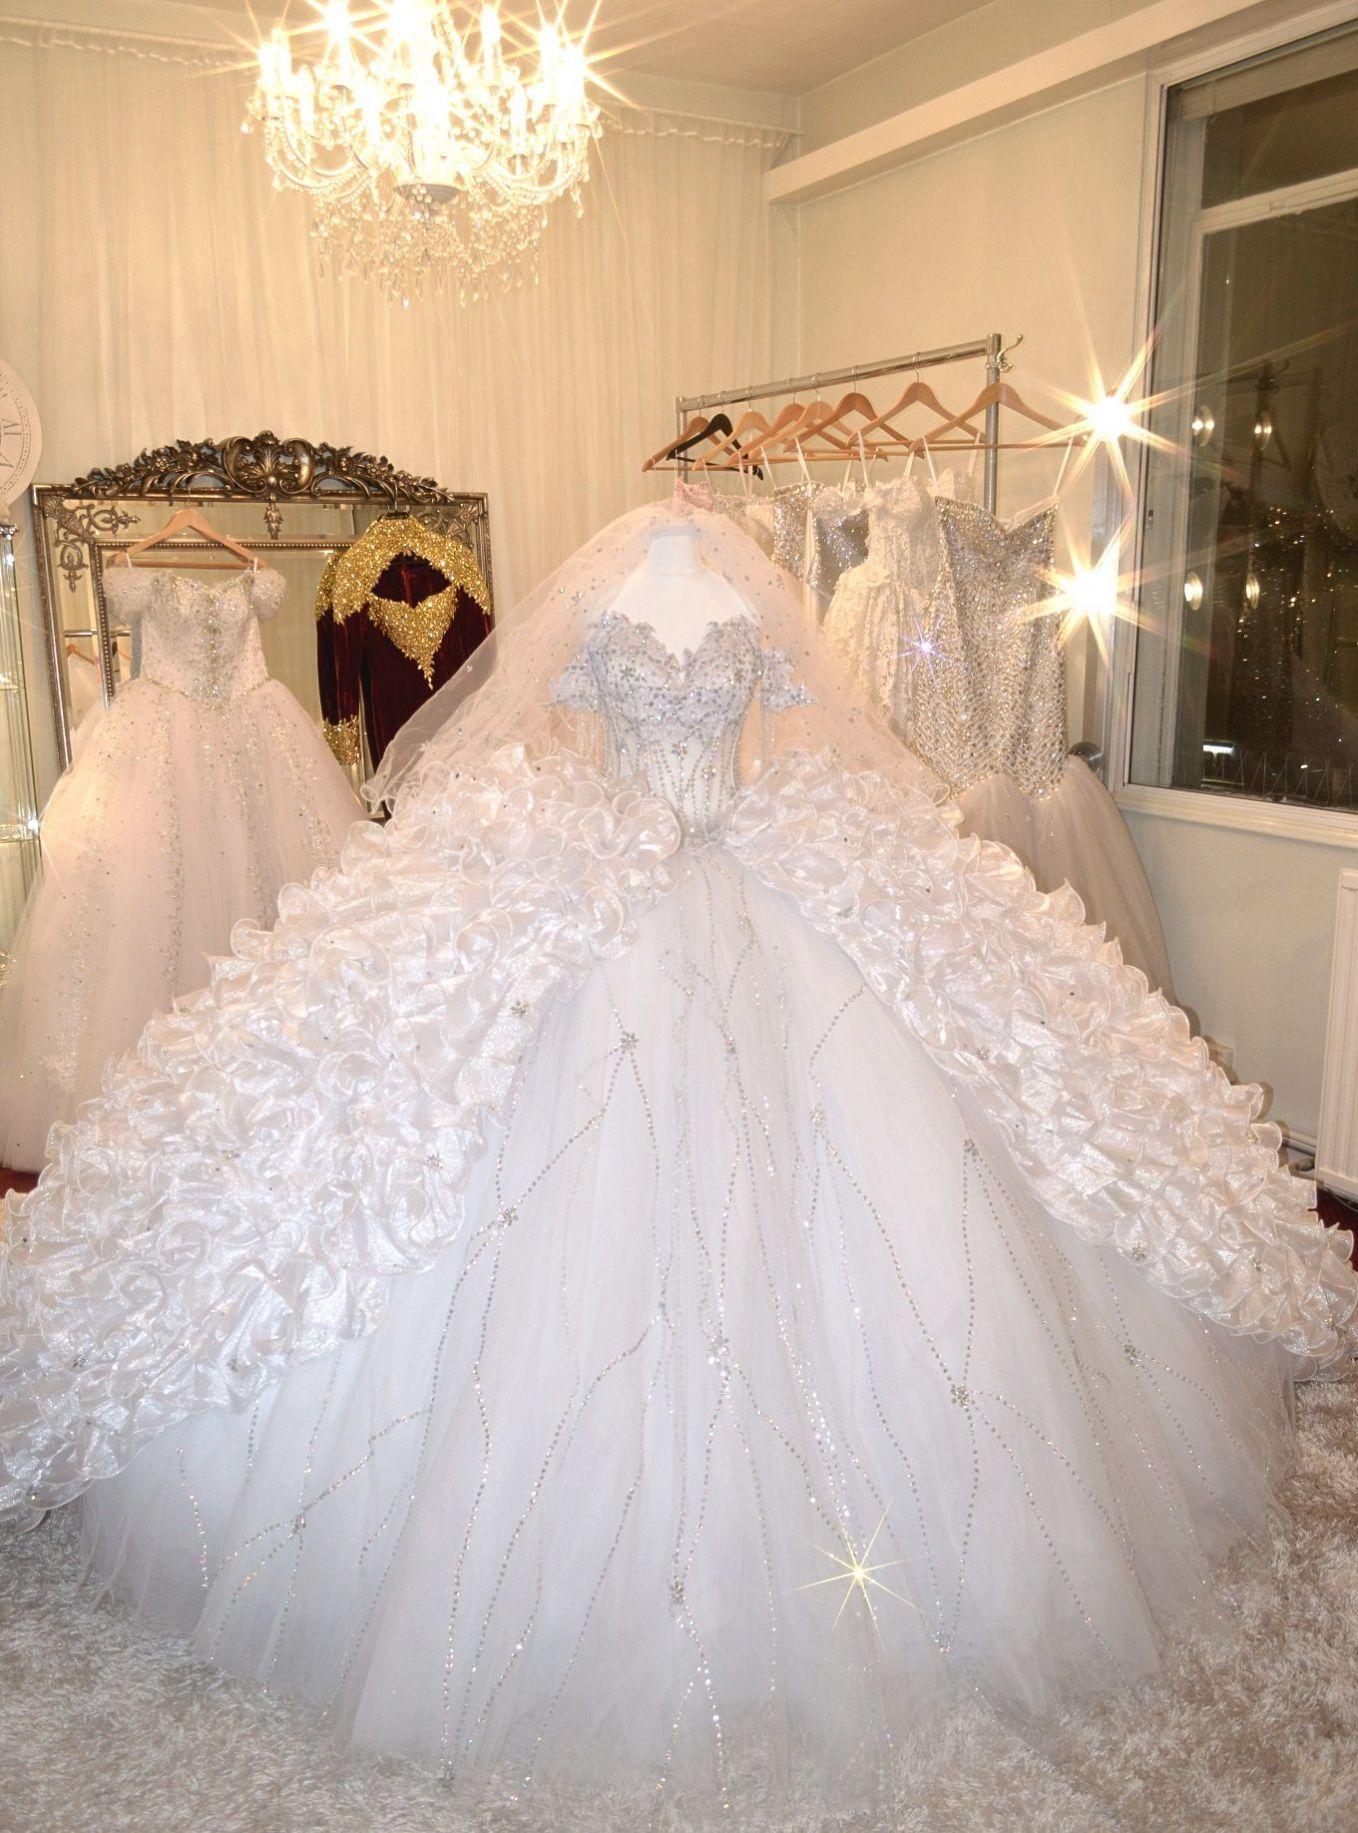 See through corset wedding dresses  SEXY AURORA BOREALIS SEE THROUGH CORSET WEDDING DRESS  METER WIDE